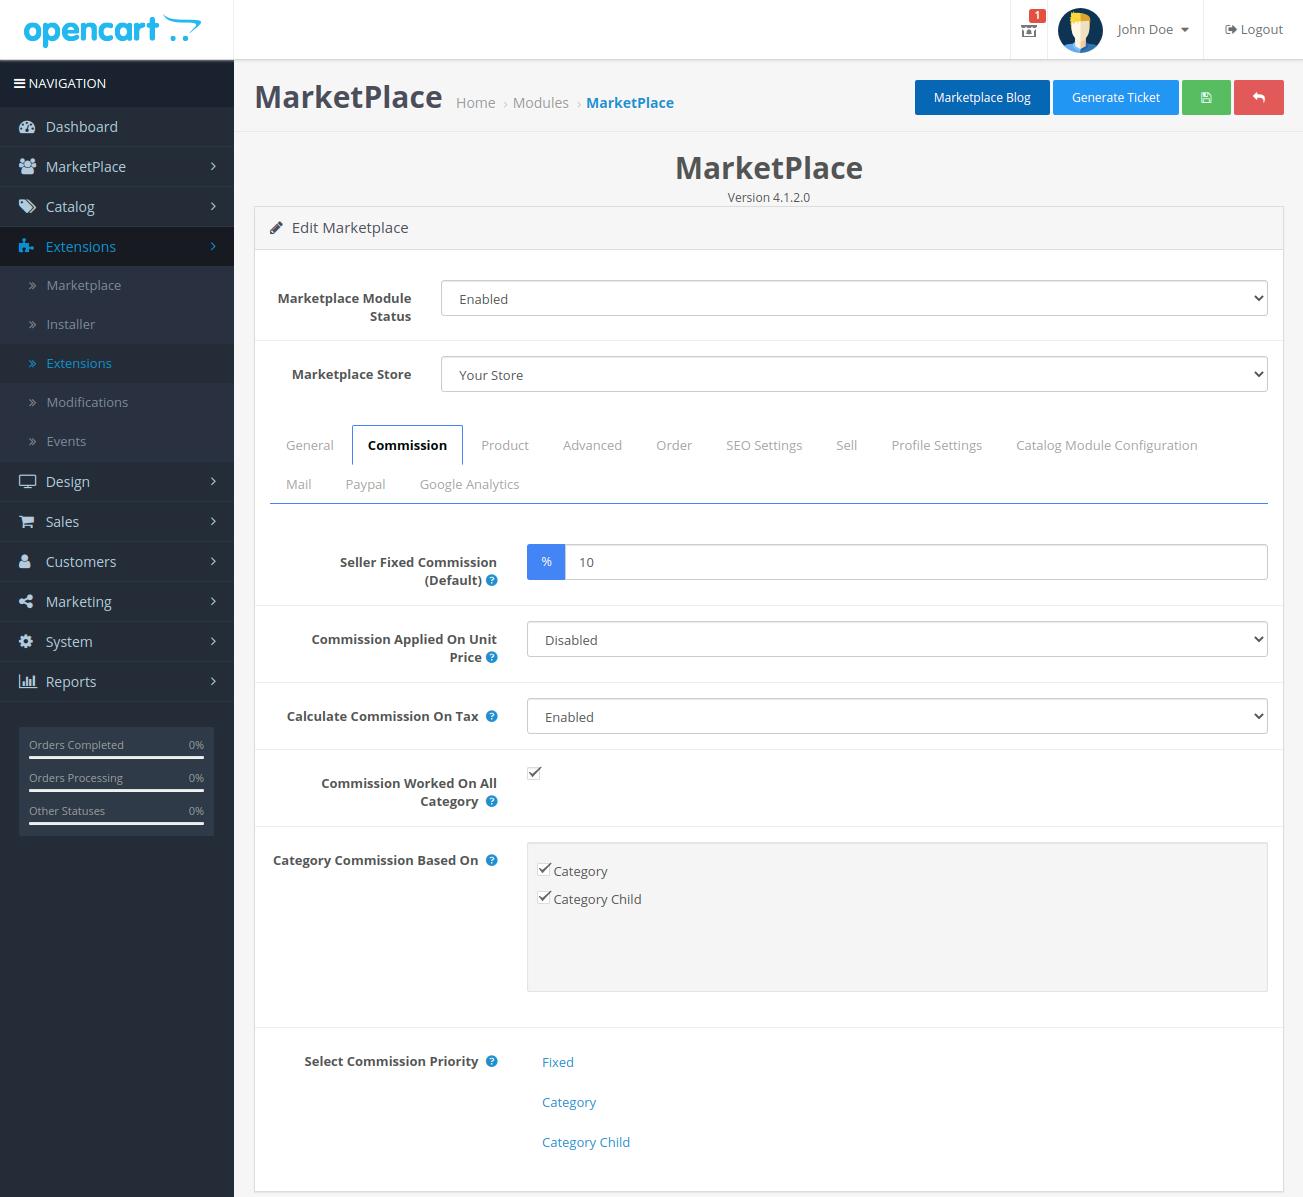 webkul-opencart-multi-vendor-marketplace-commission-tab